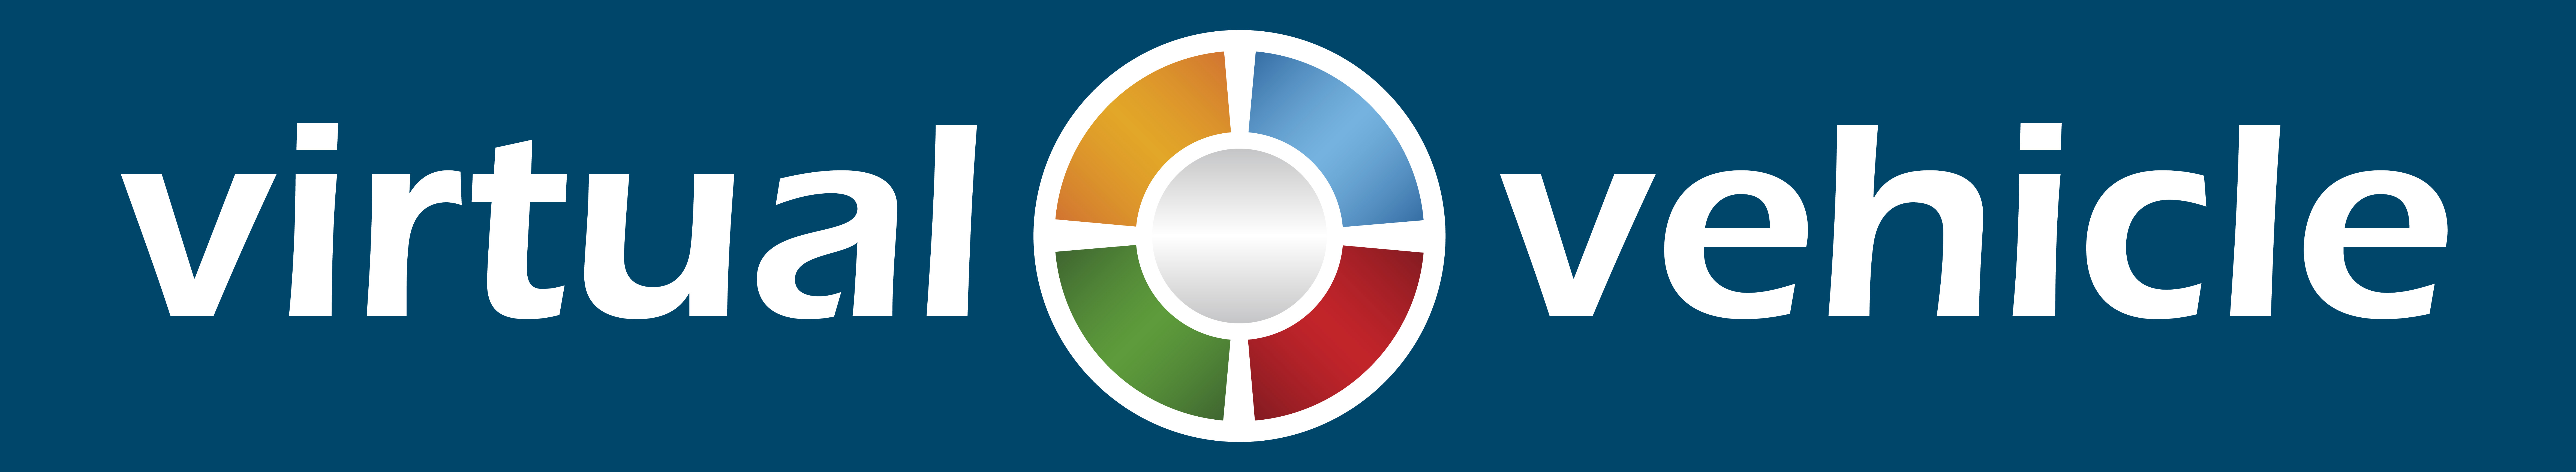 virtual vehicle Logo